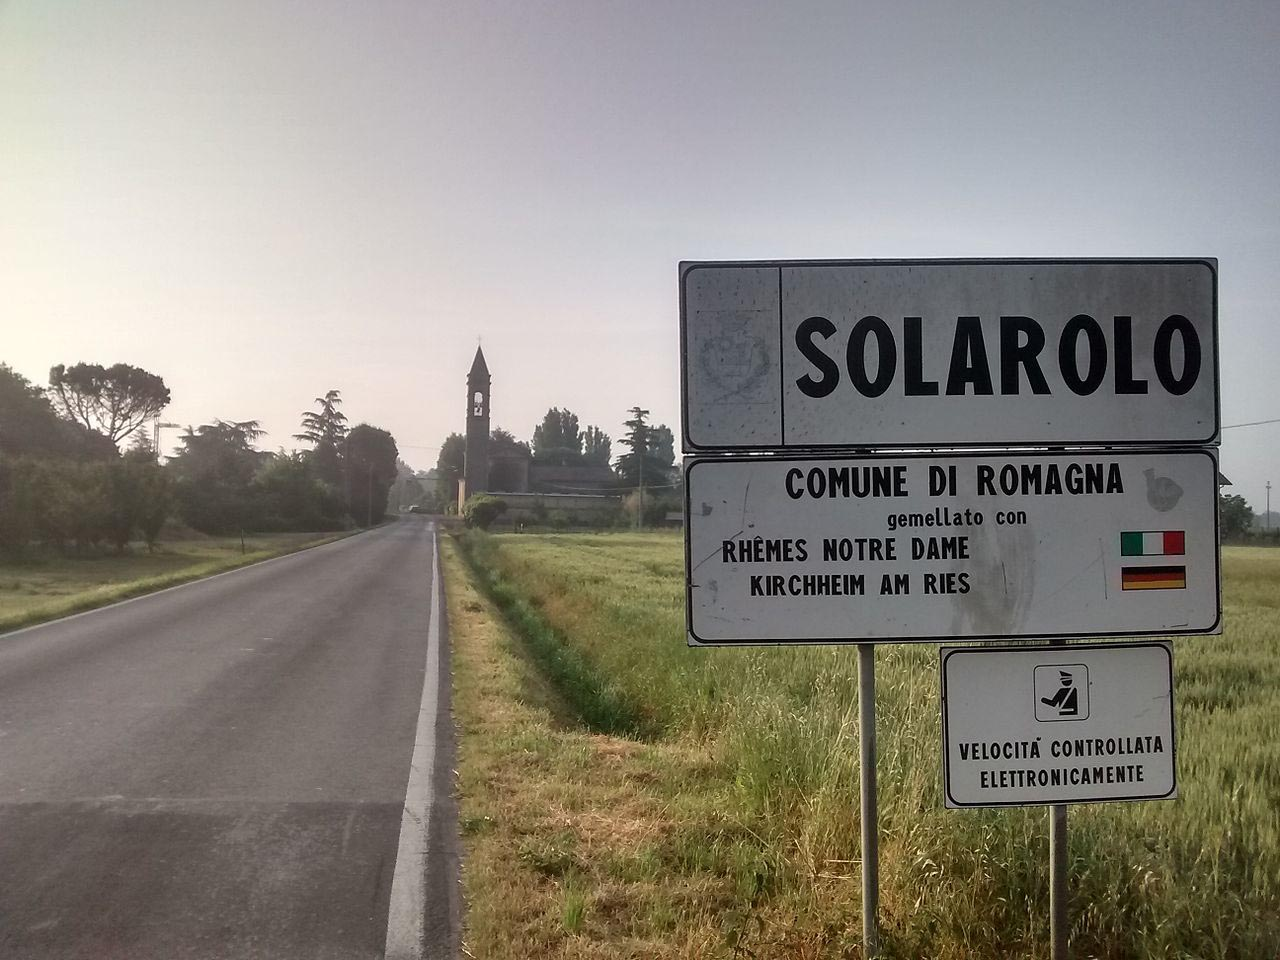 SOLAROLO